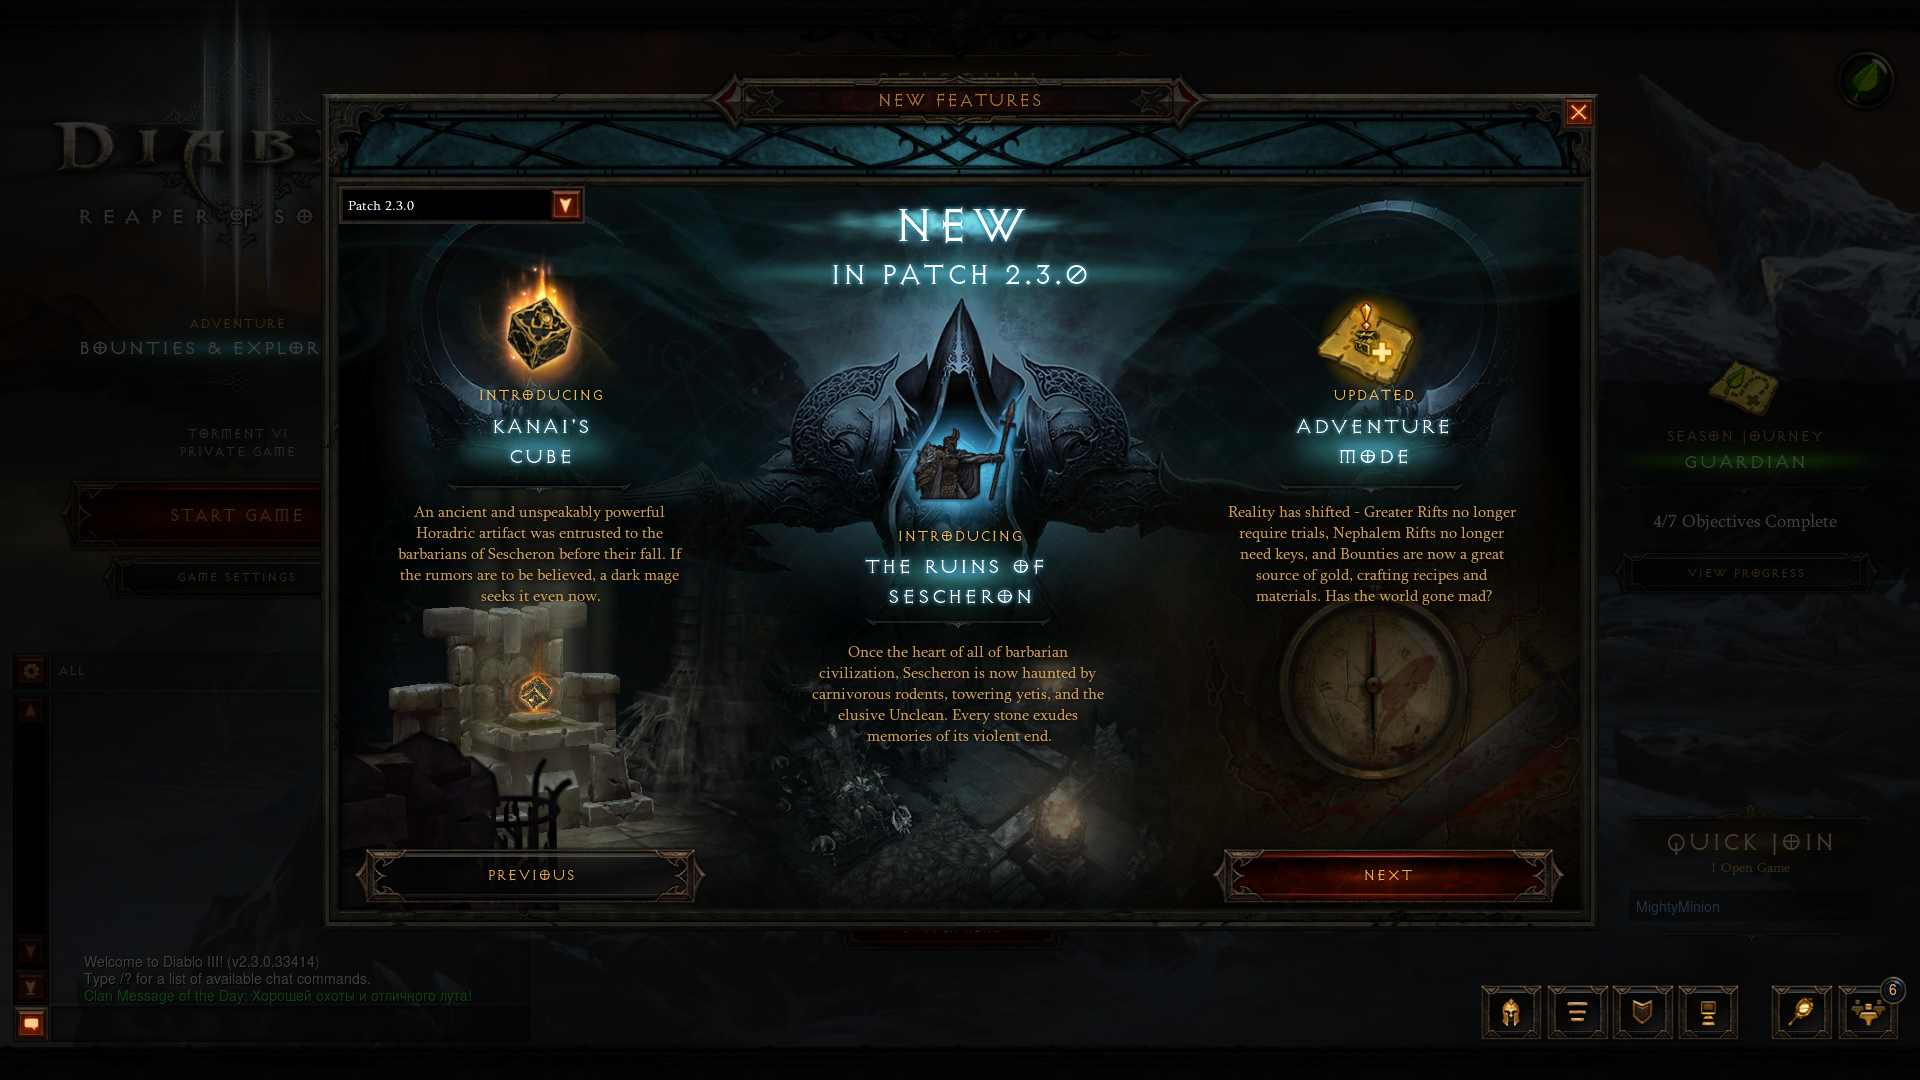 Diablo 3. Вкратце о патче 2.3.0 и о четвертом сезоне - Изображение 1